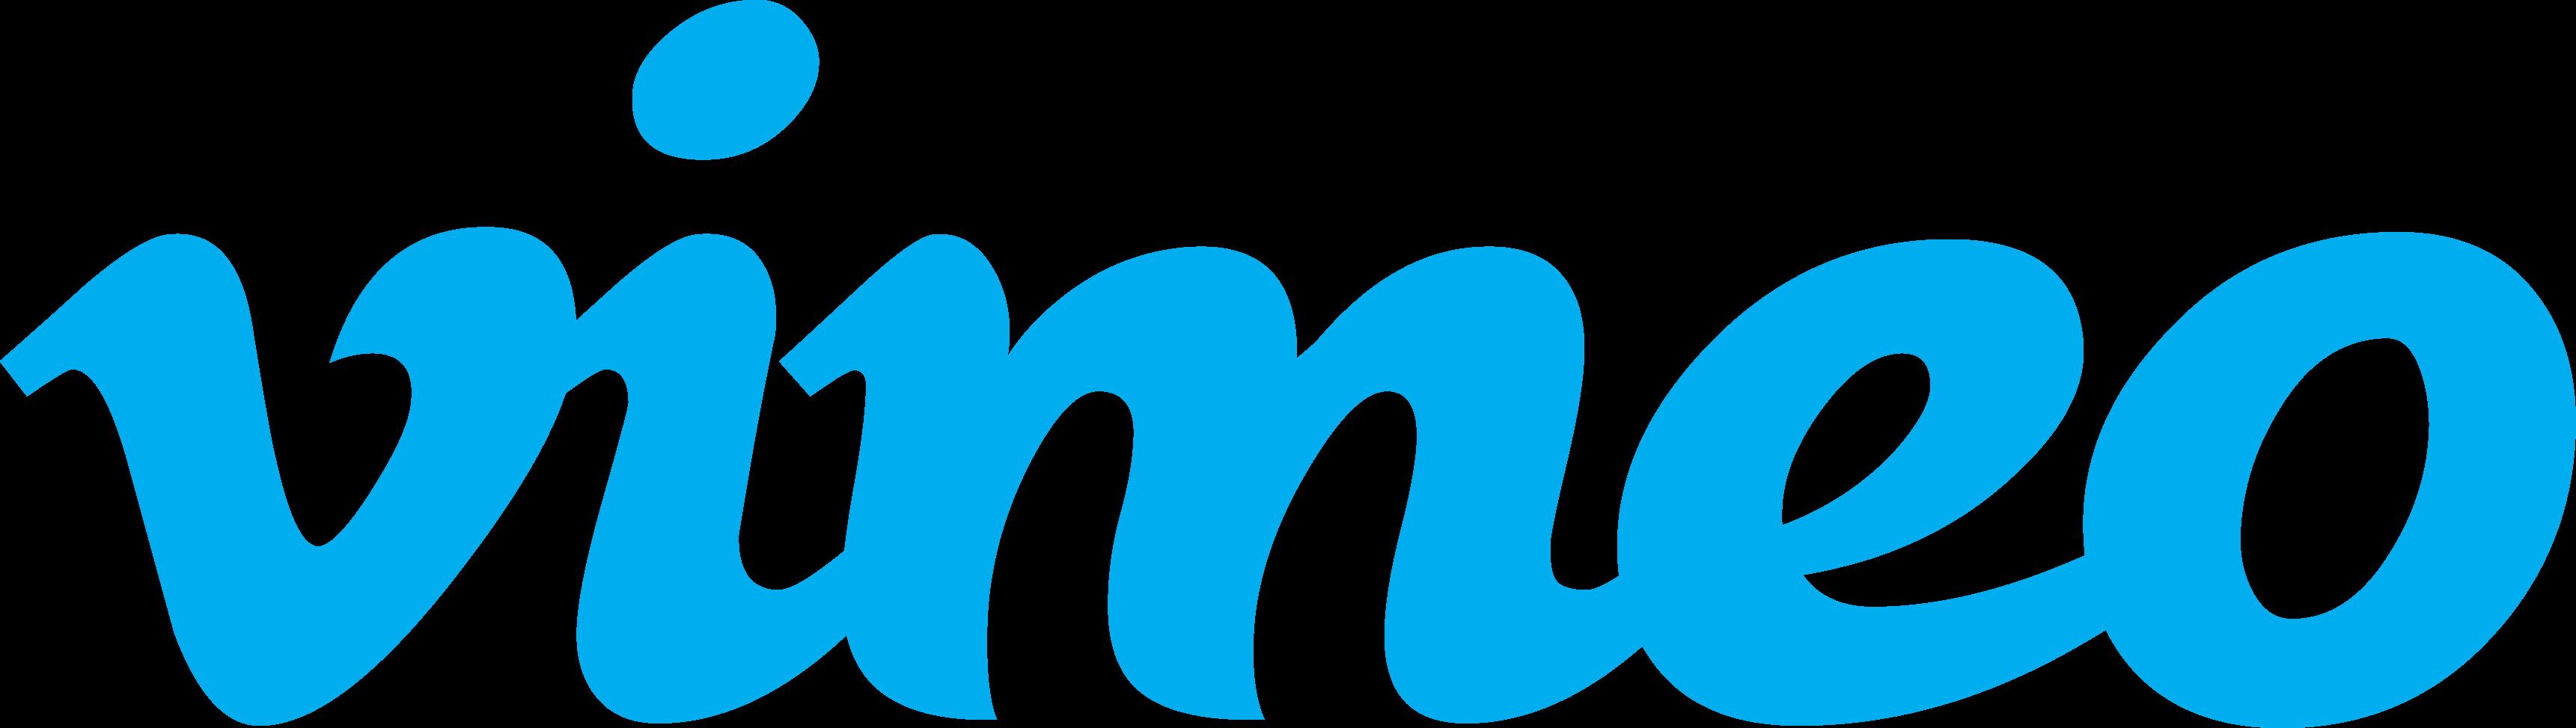 pngkey.com-vidme-logo-png-6472215